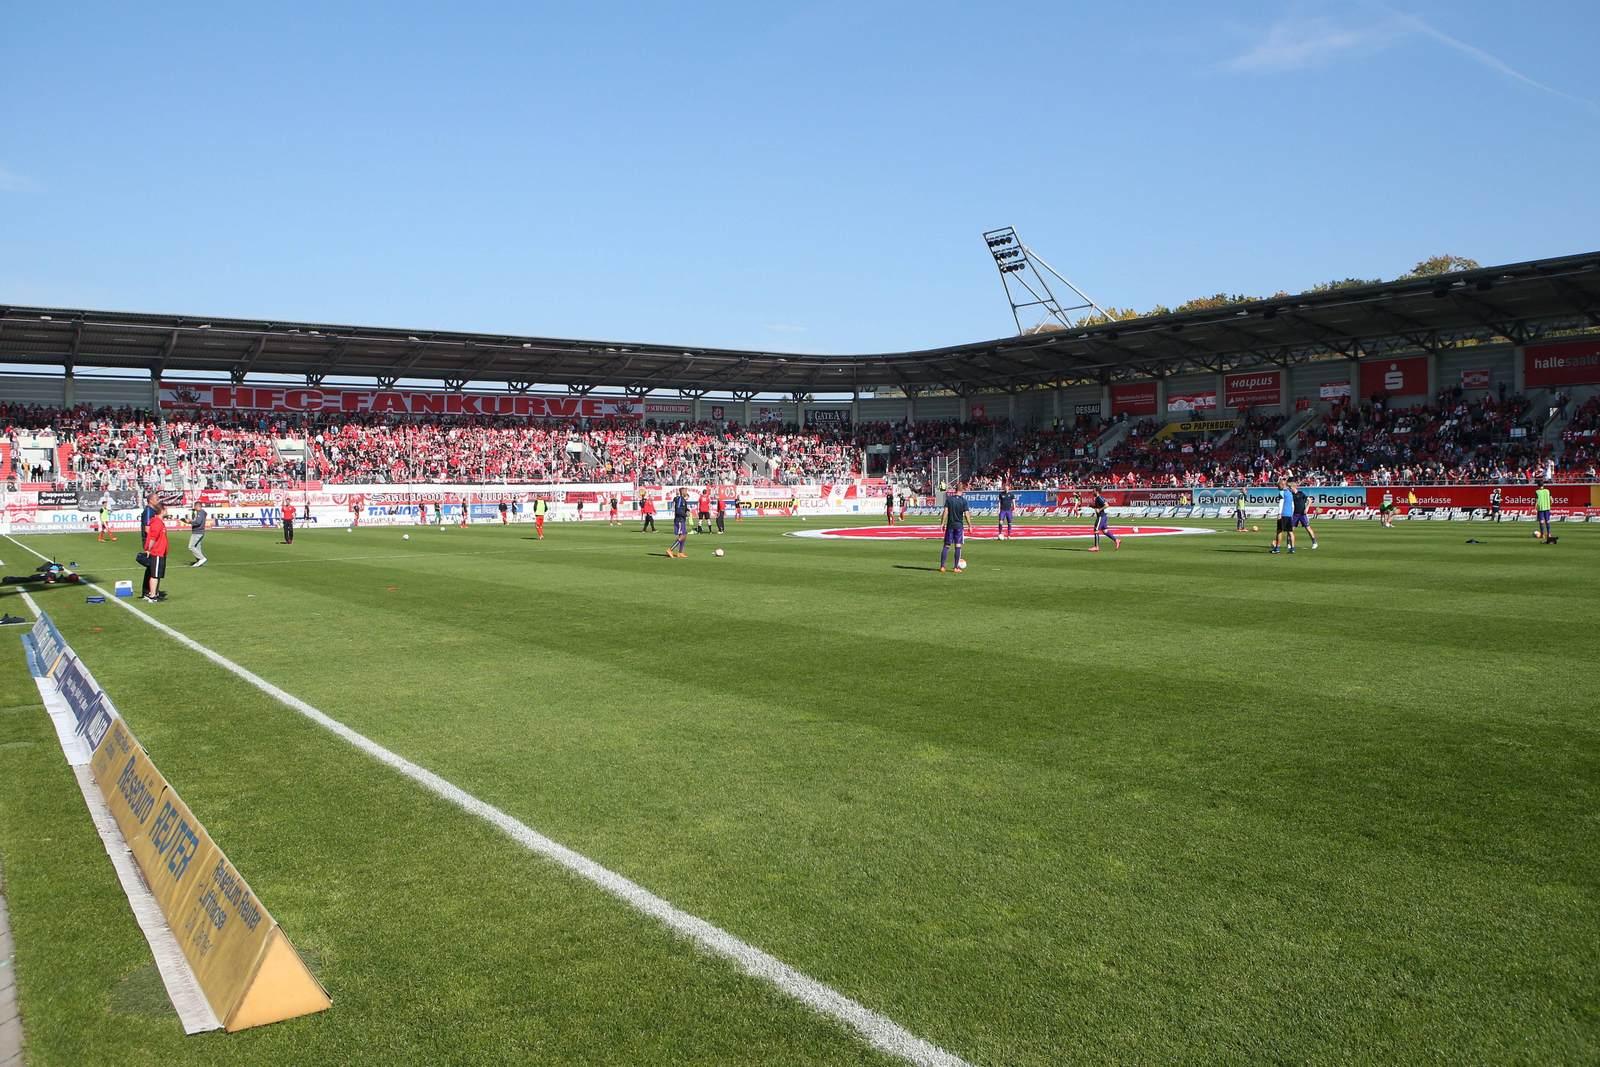 Die Partie Hallescher FC gegen Hansa Rostock soll abgesagt werden.